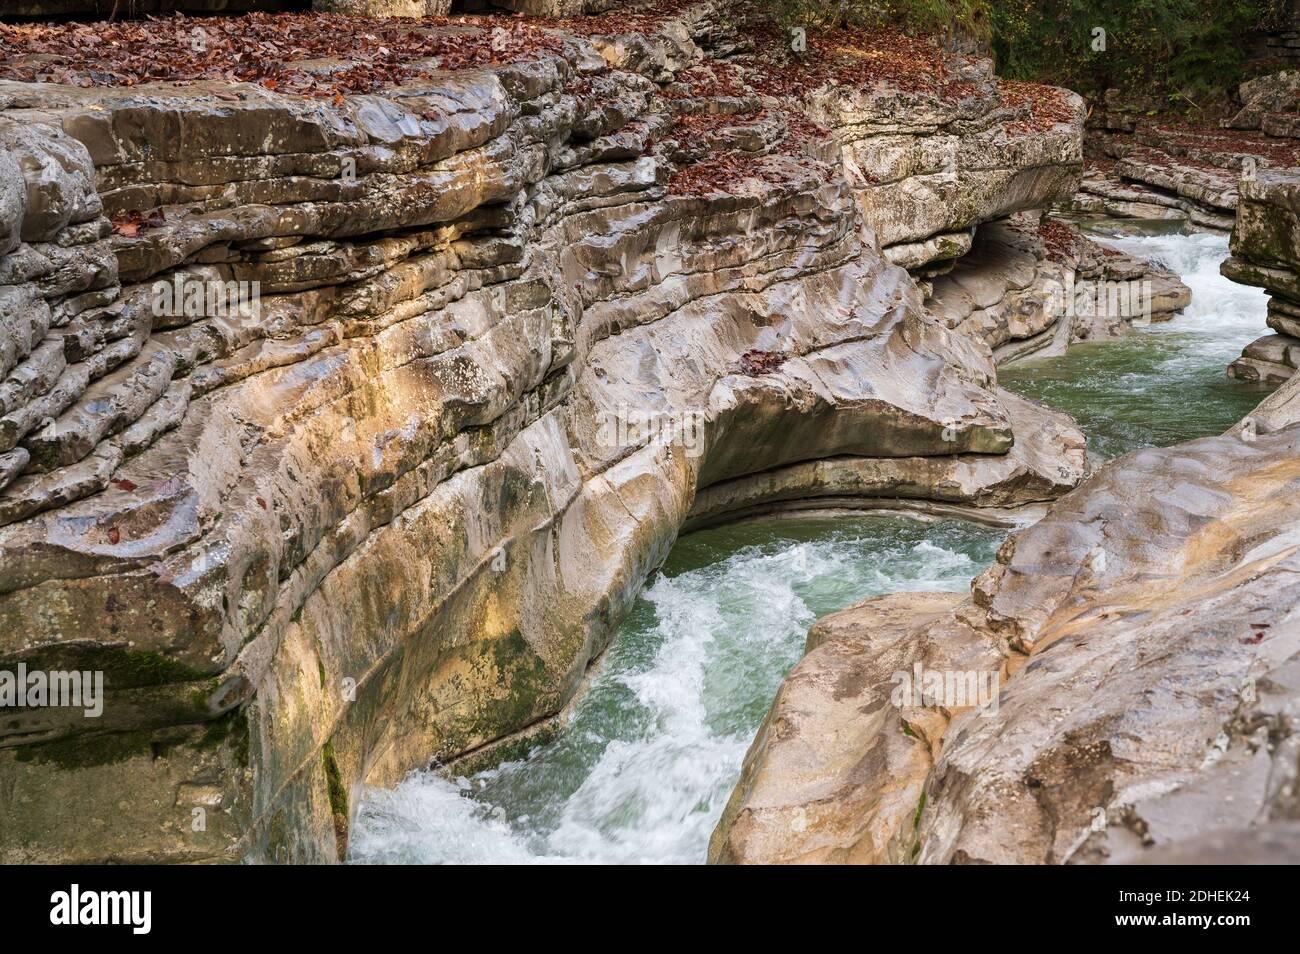 A beautifu shot of a wild mountain river in Salzburg called Taugl Stock Photo